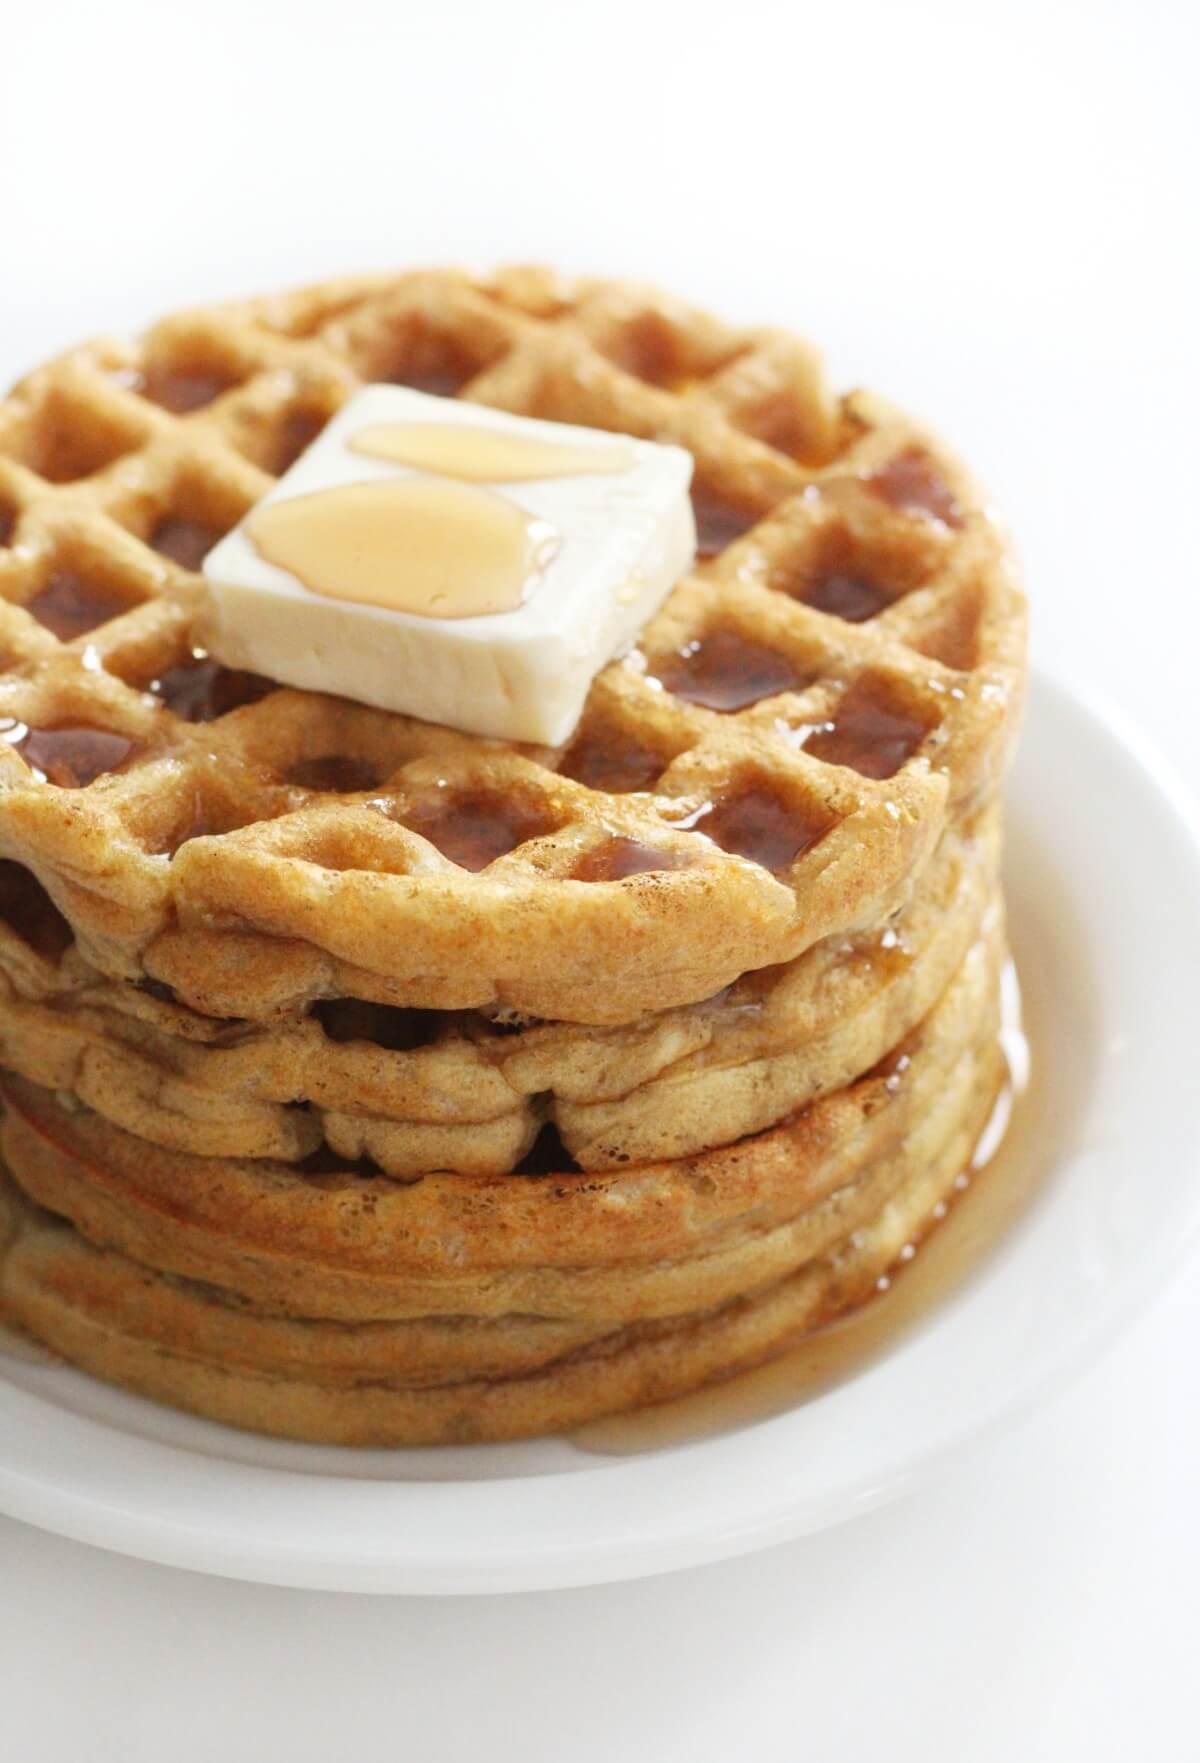 stack of 4 gluten-free vegan buttermilk waffles on plate